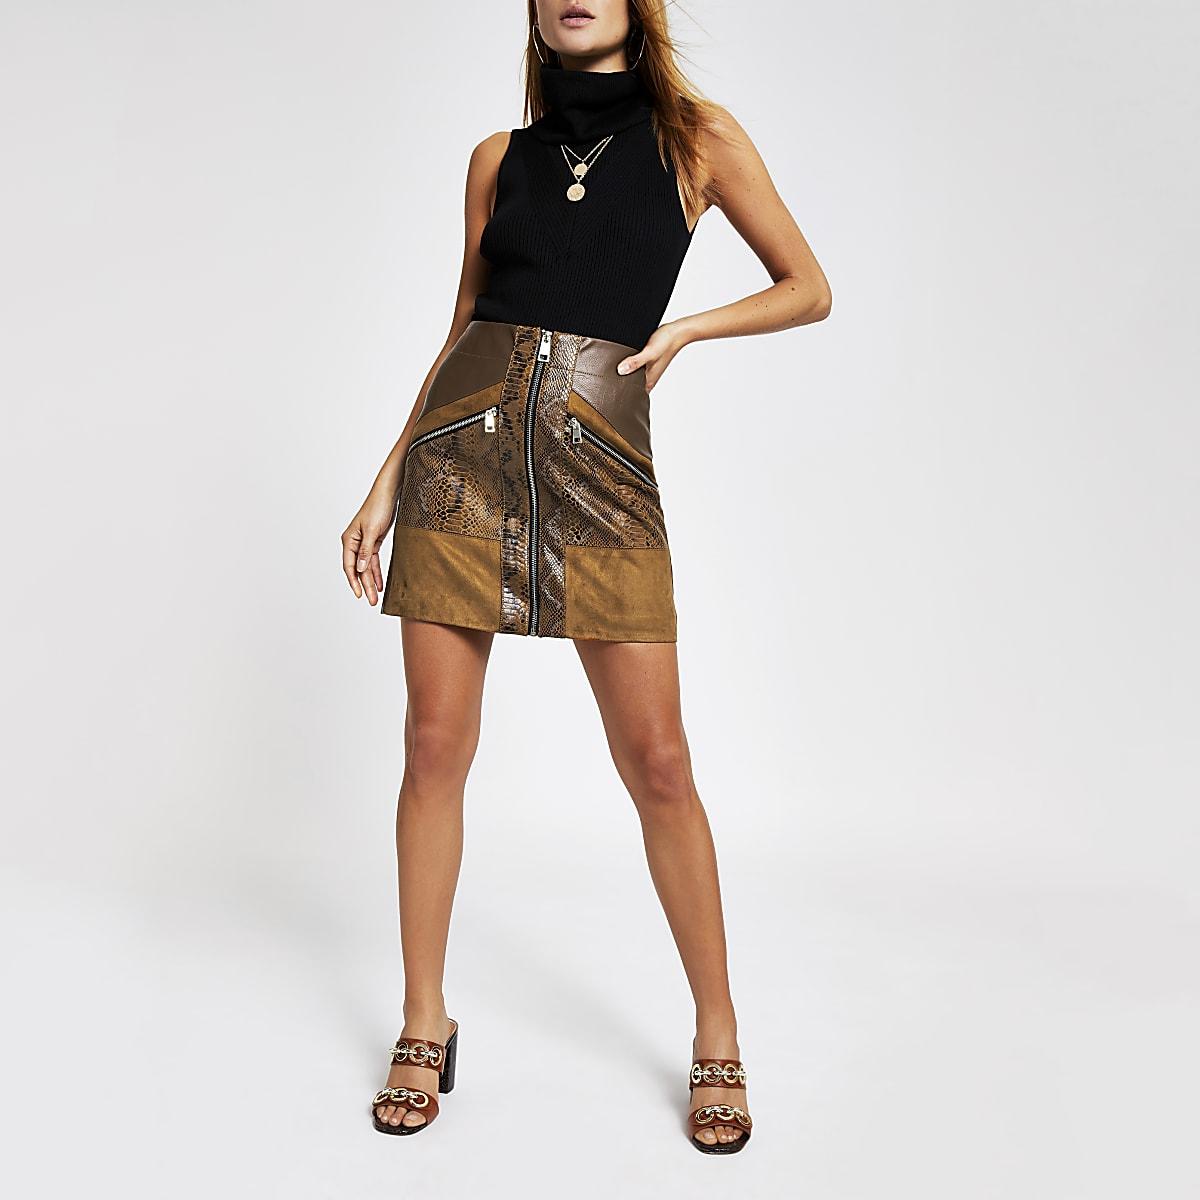 c7b826569f Brown snake print faux leather mini skirt - Mini Skirts - Skirts - women